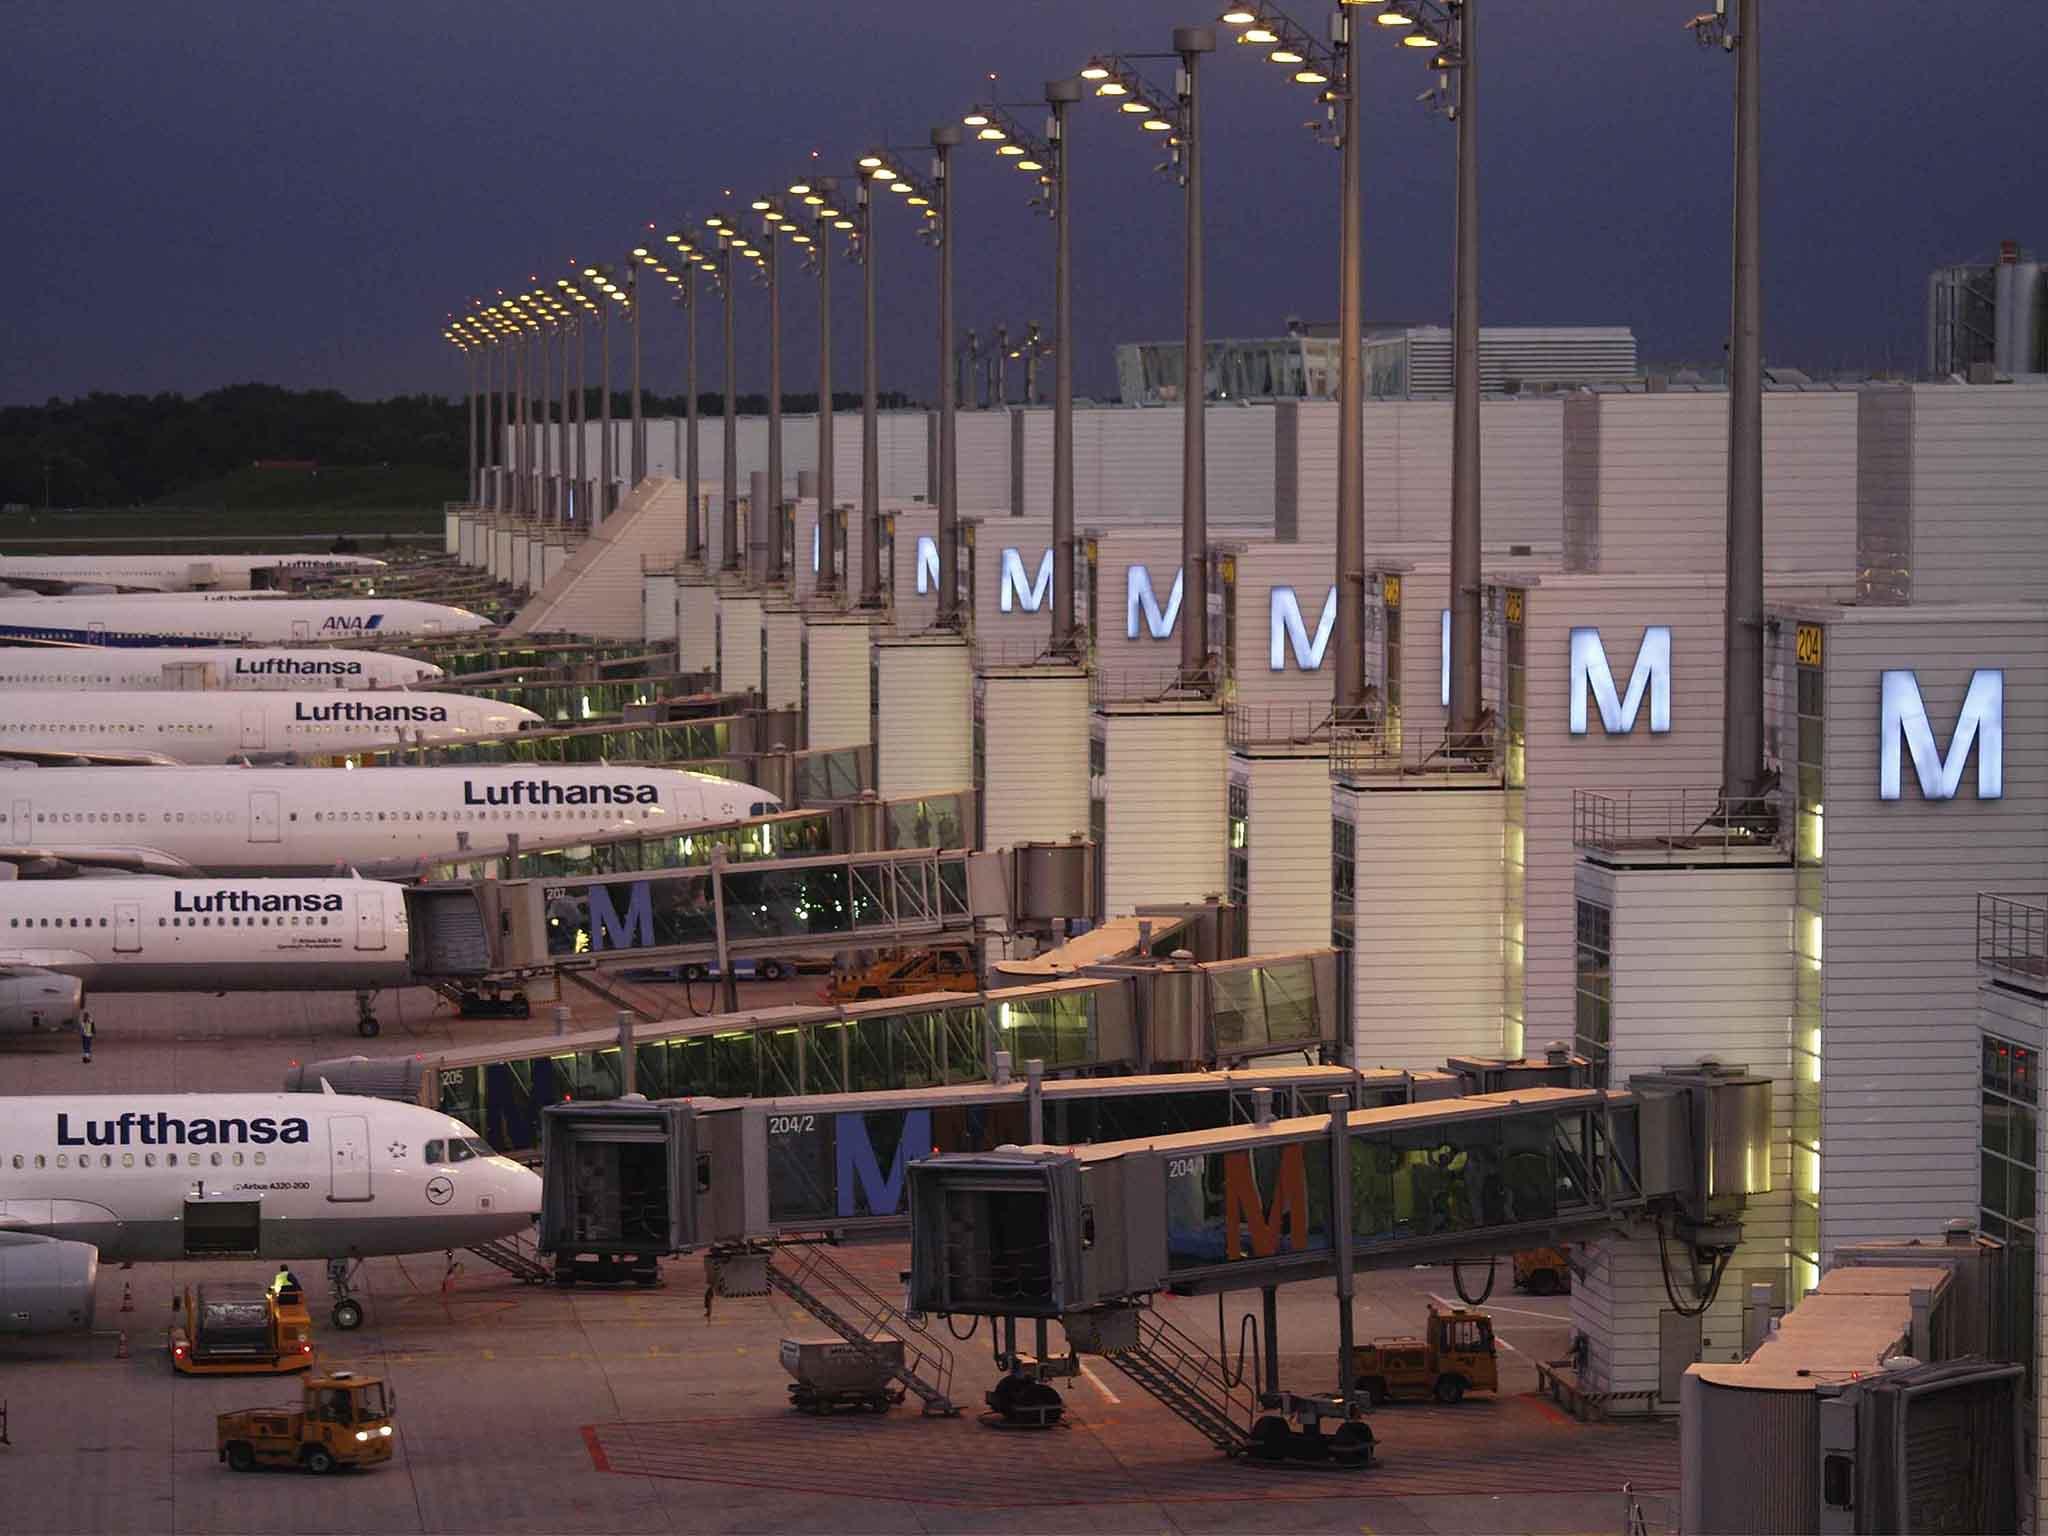 Mercure Hotel Flughafen Munchen